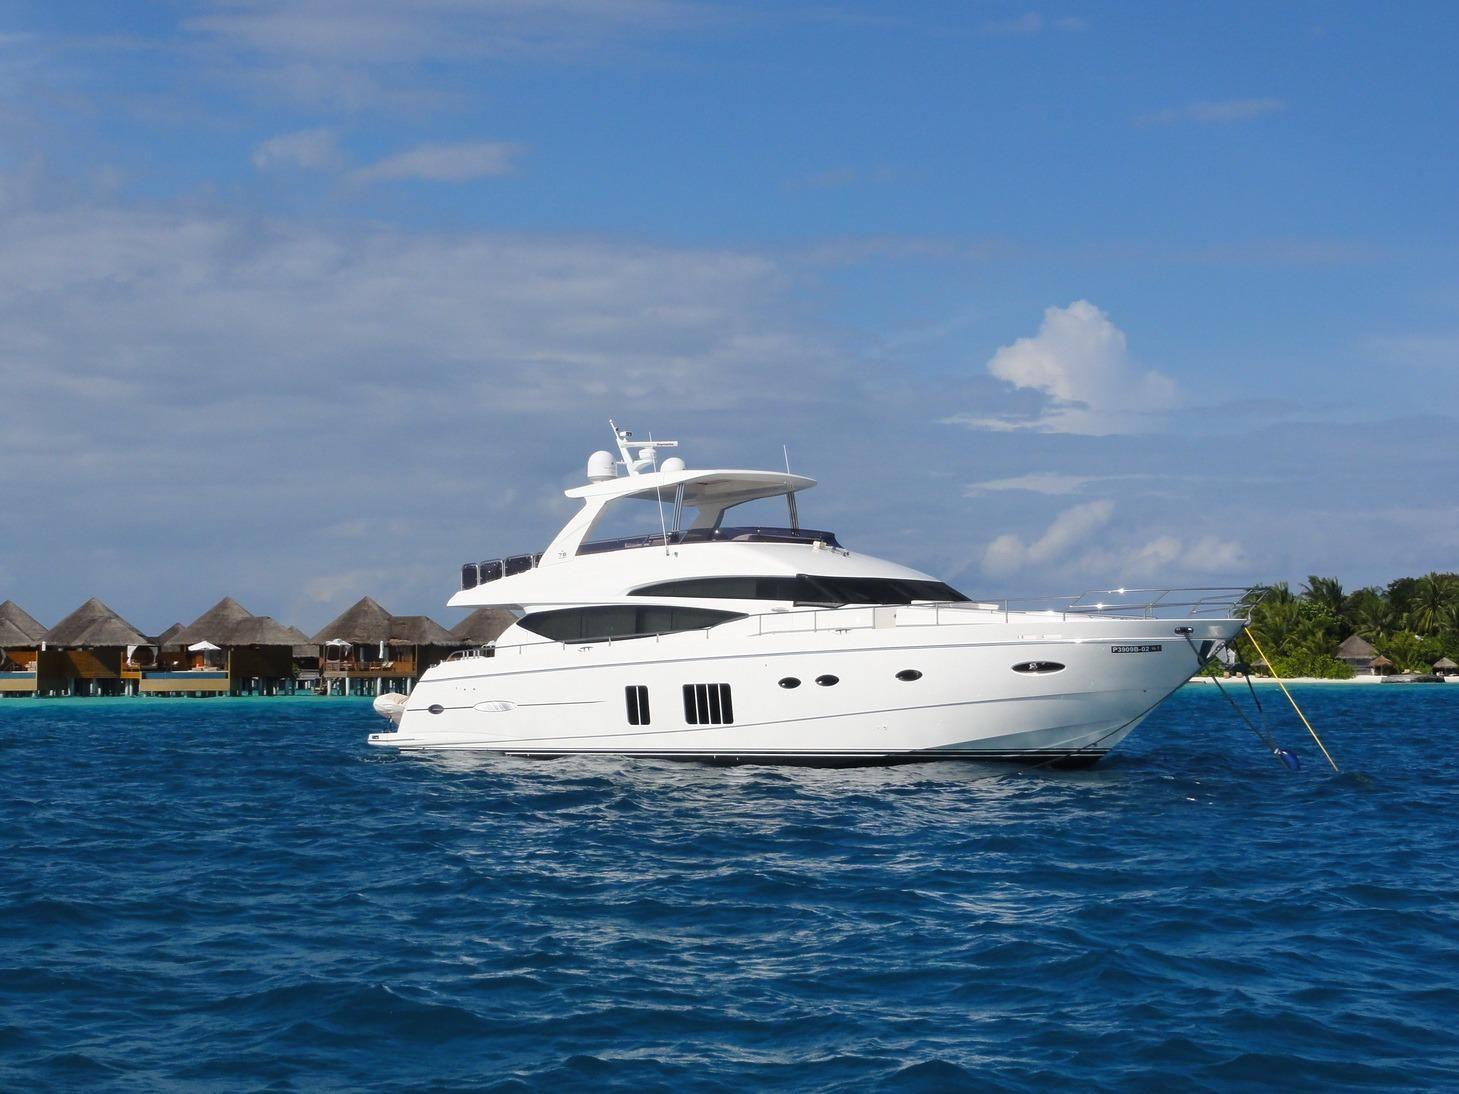 2013 Princess 78 Motor Yacht Power Boat For Sale Www